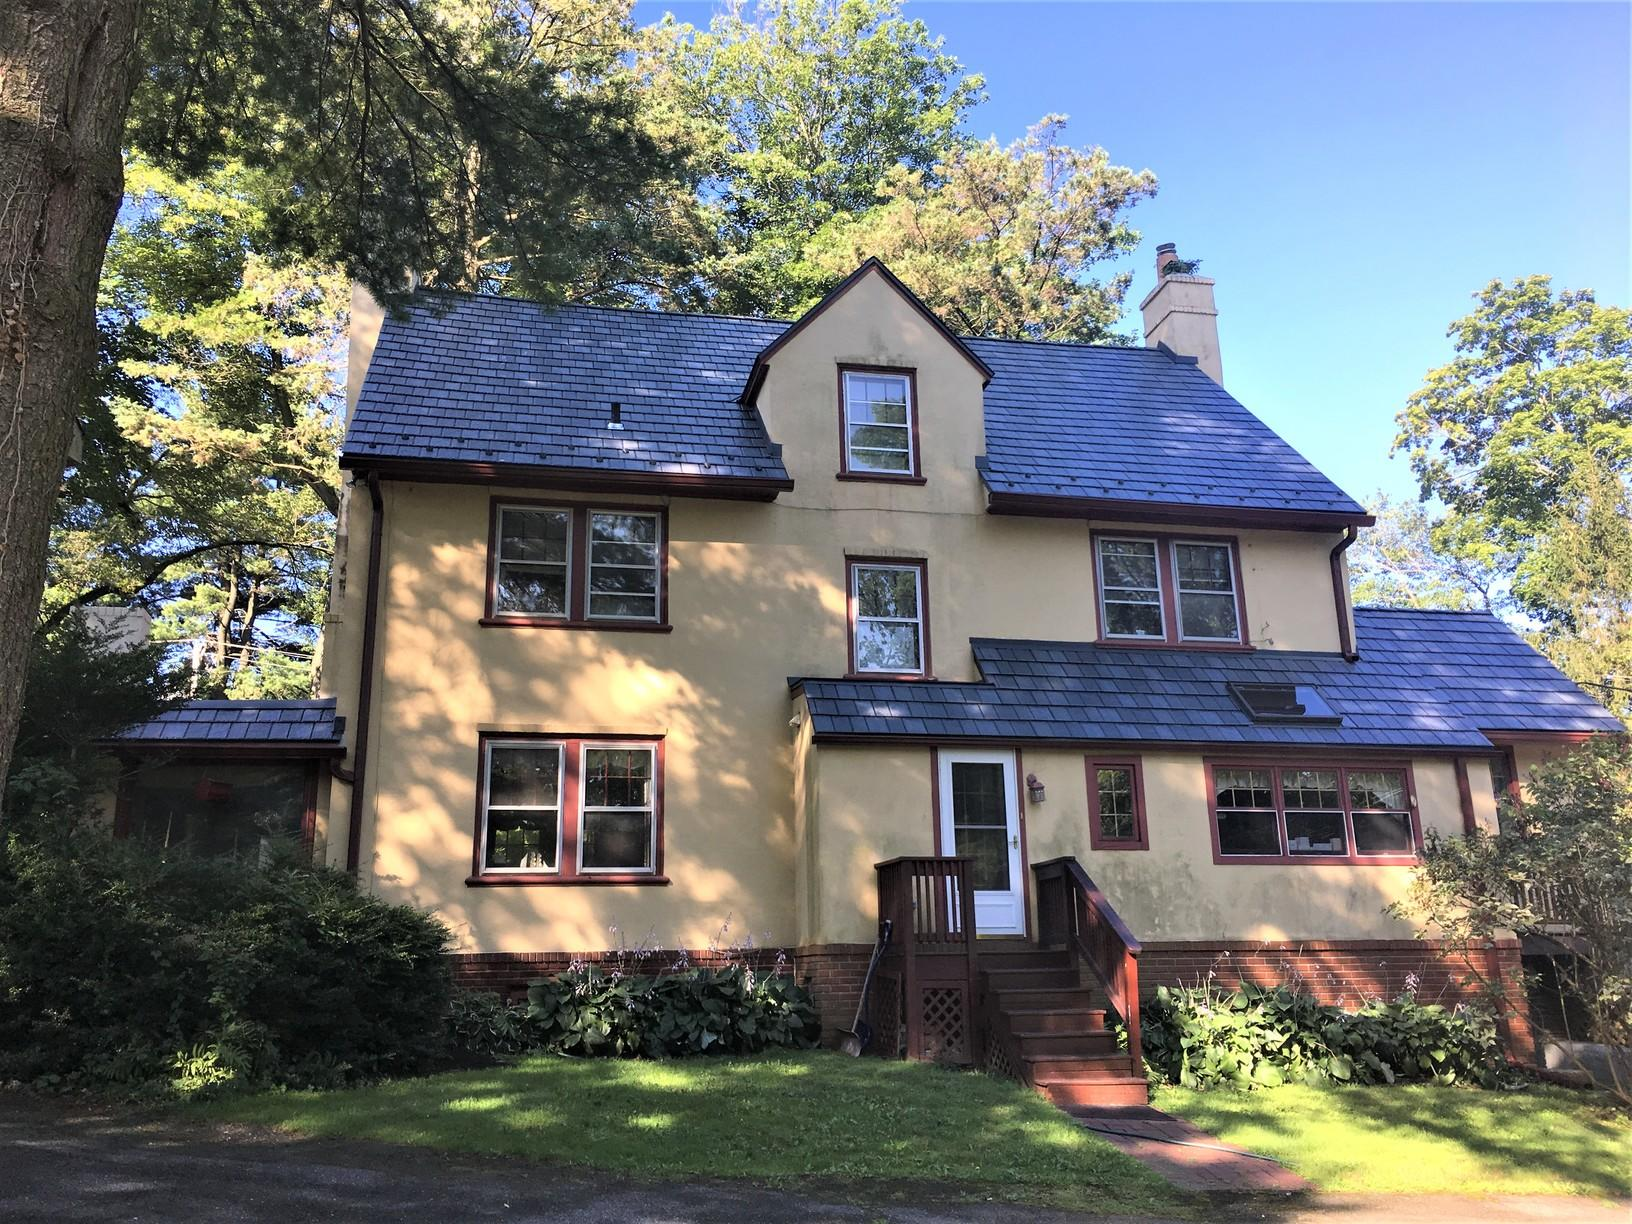 Metal Slate Roof Restoration in Villanova, PA - After Photo